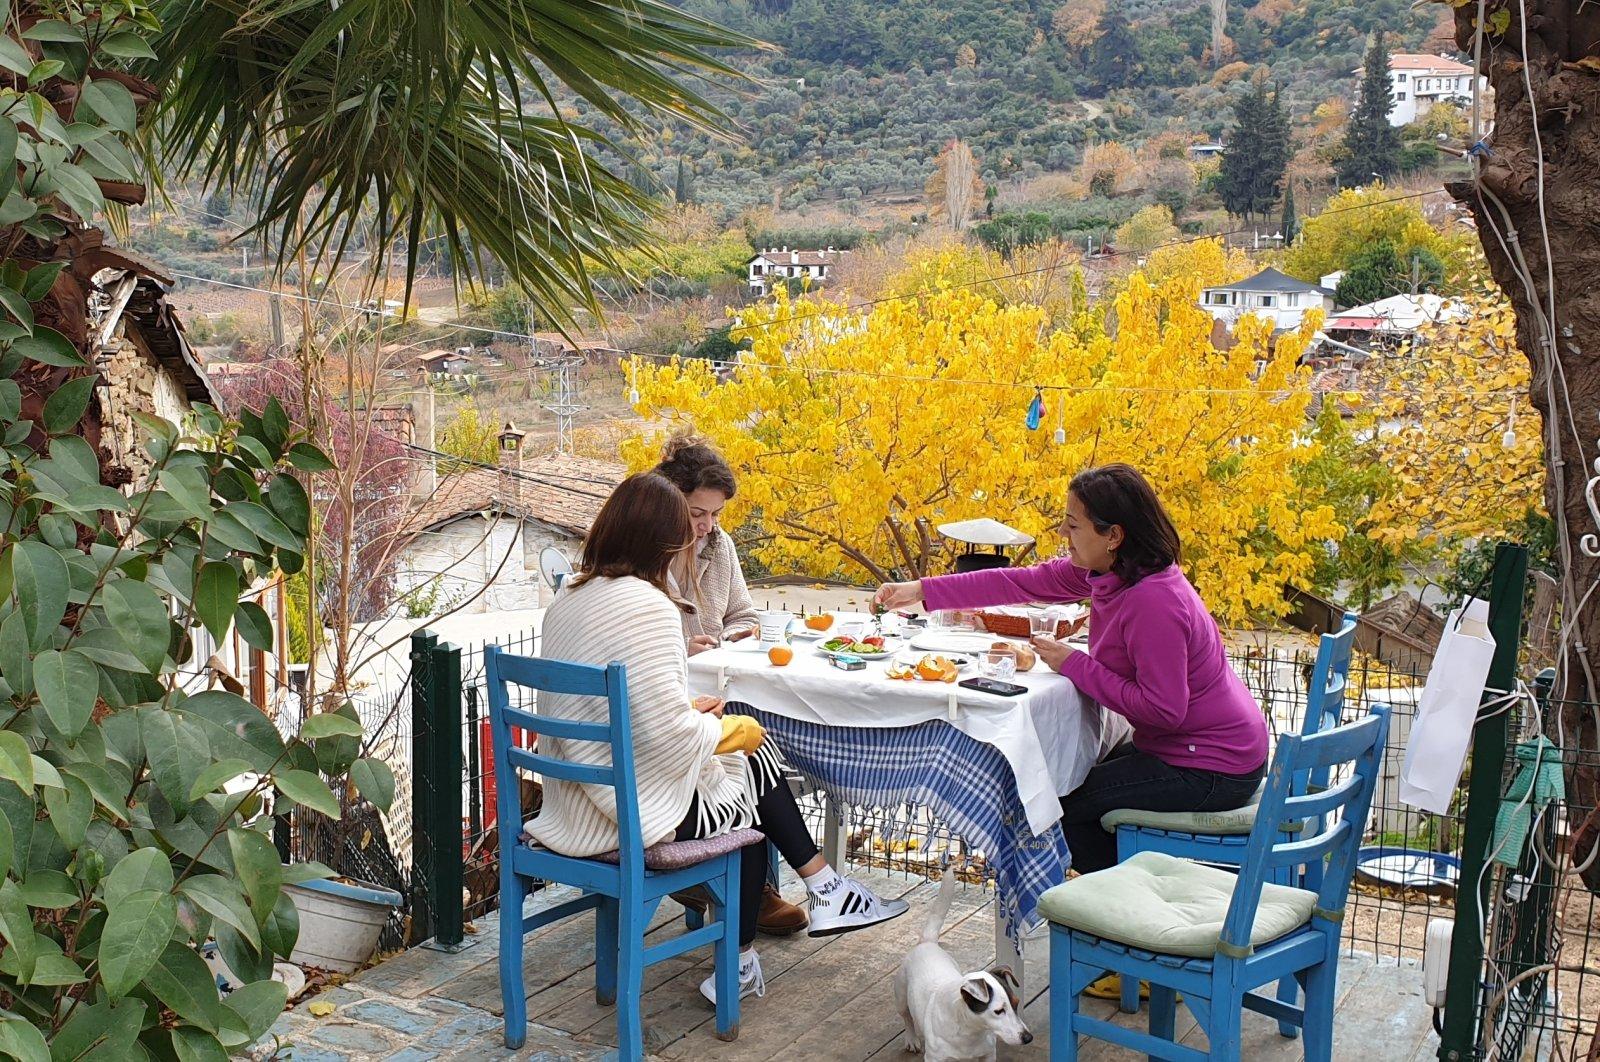 People have breakfast at a lodge in Şirince village, in Izmir, western Turkey, Dec. 6, 2020. (AA PHOTO)